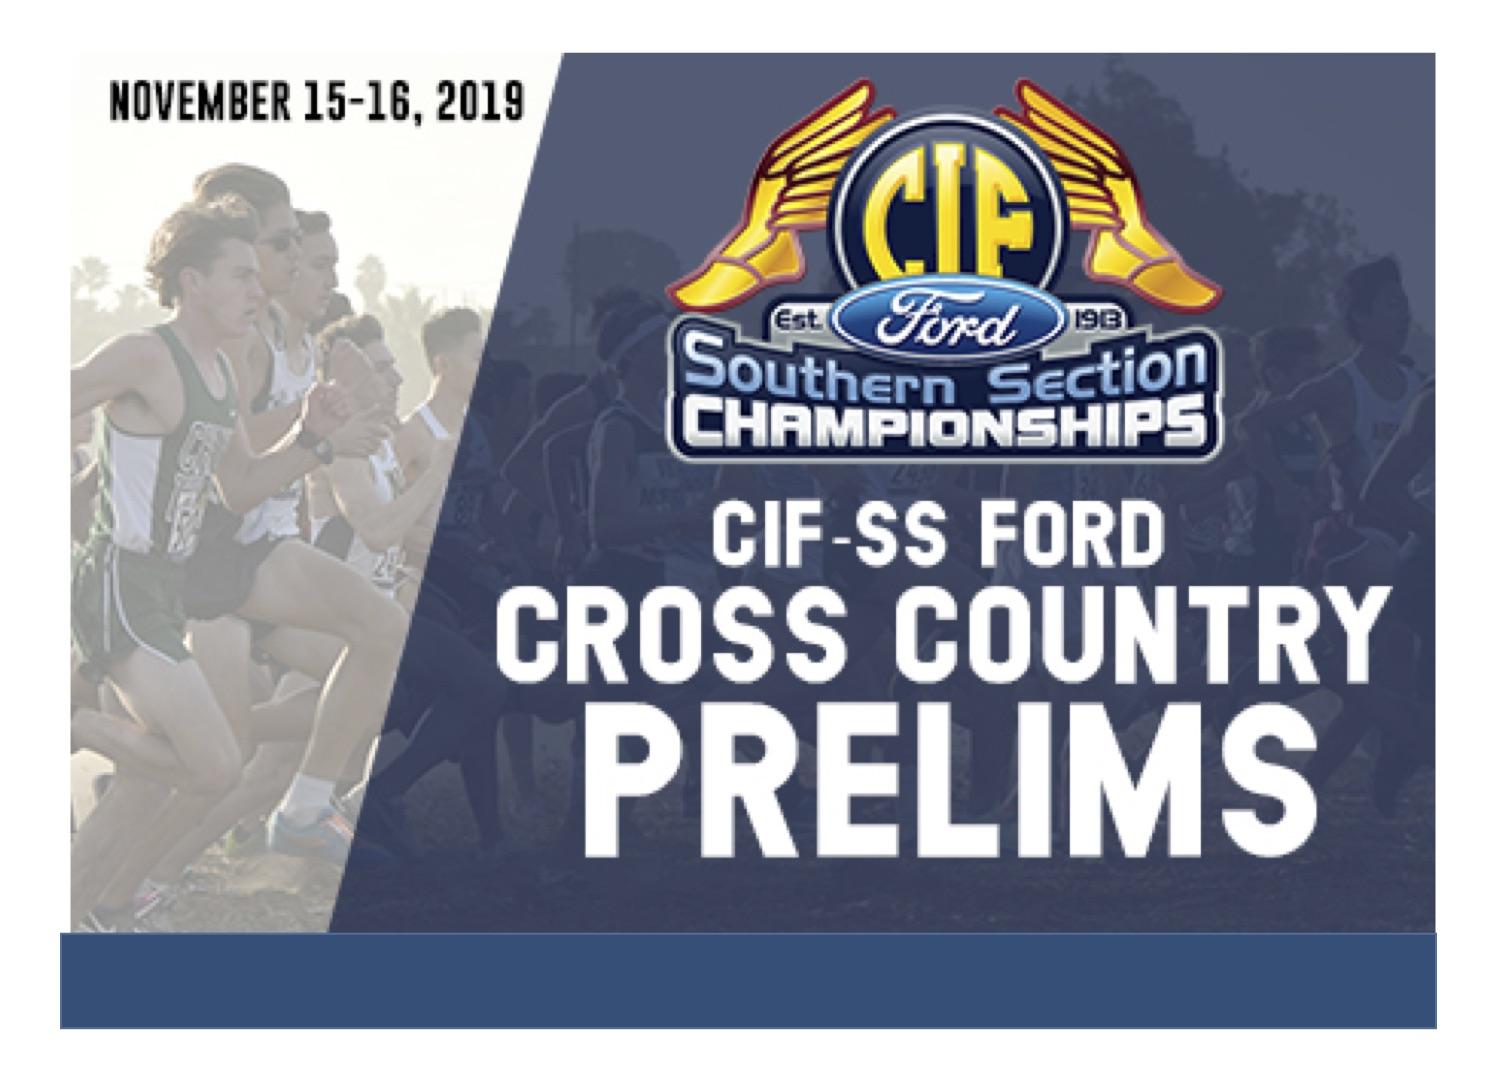 Morales & Hernandez advance to CIF Cross Country Prelims